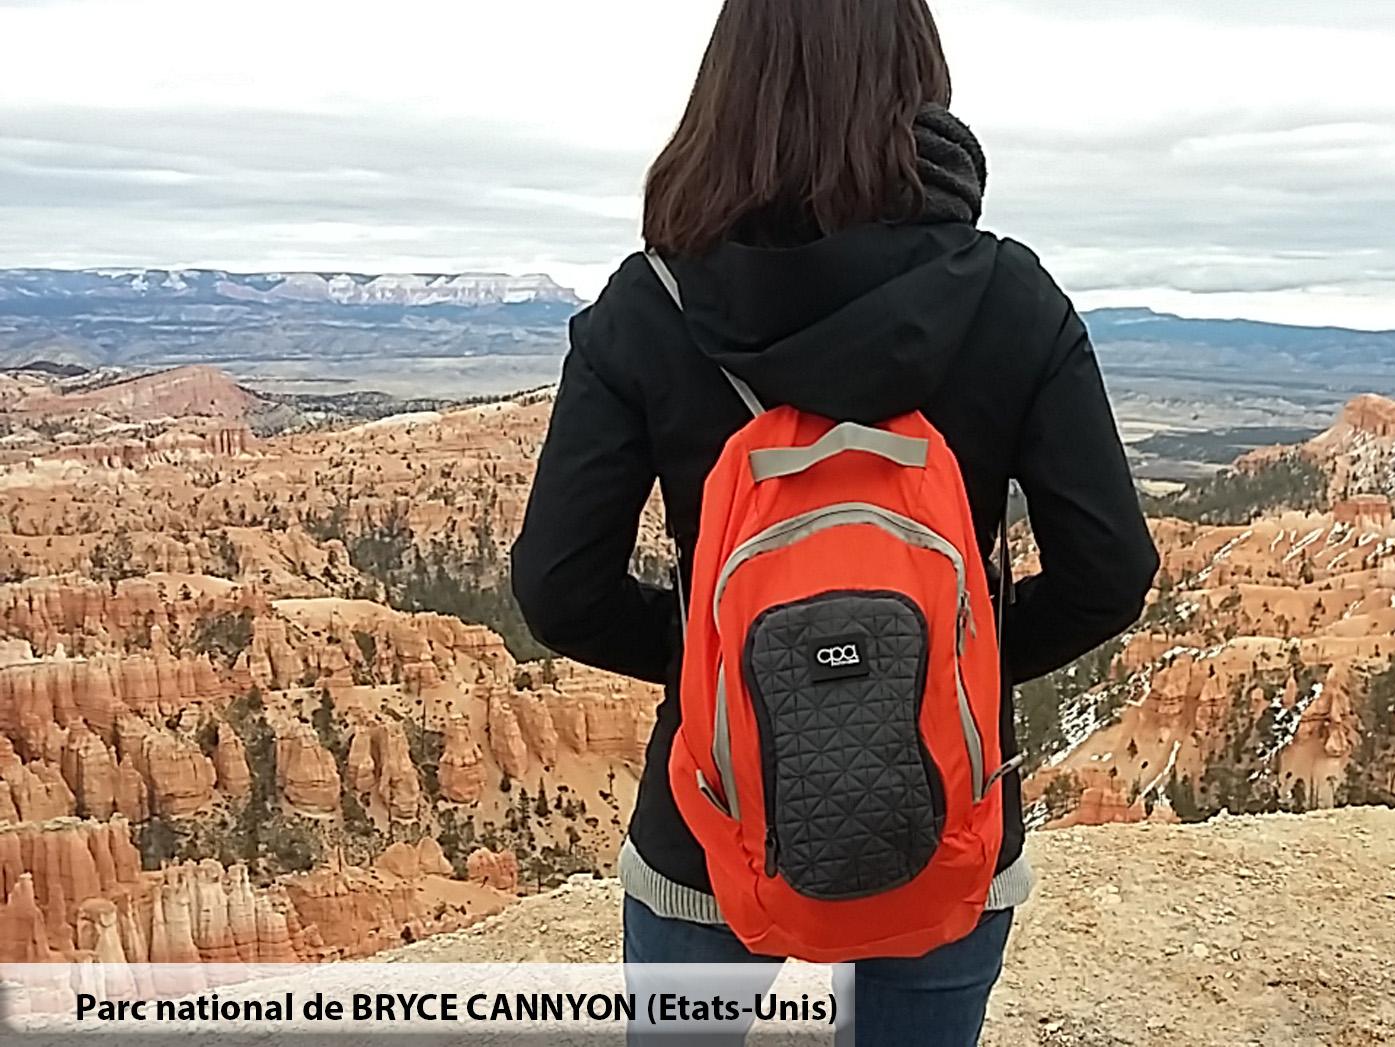 Parc de Bryce canyon